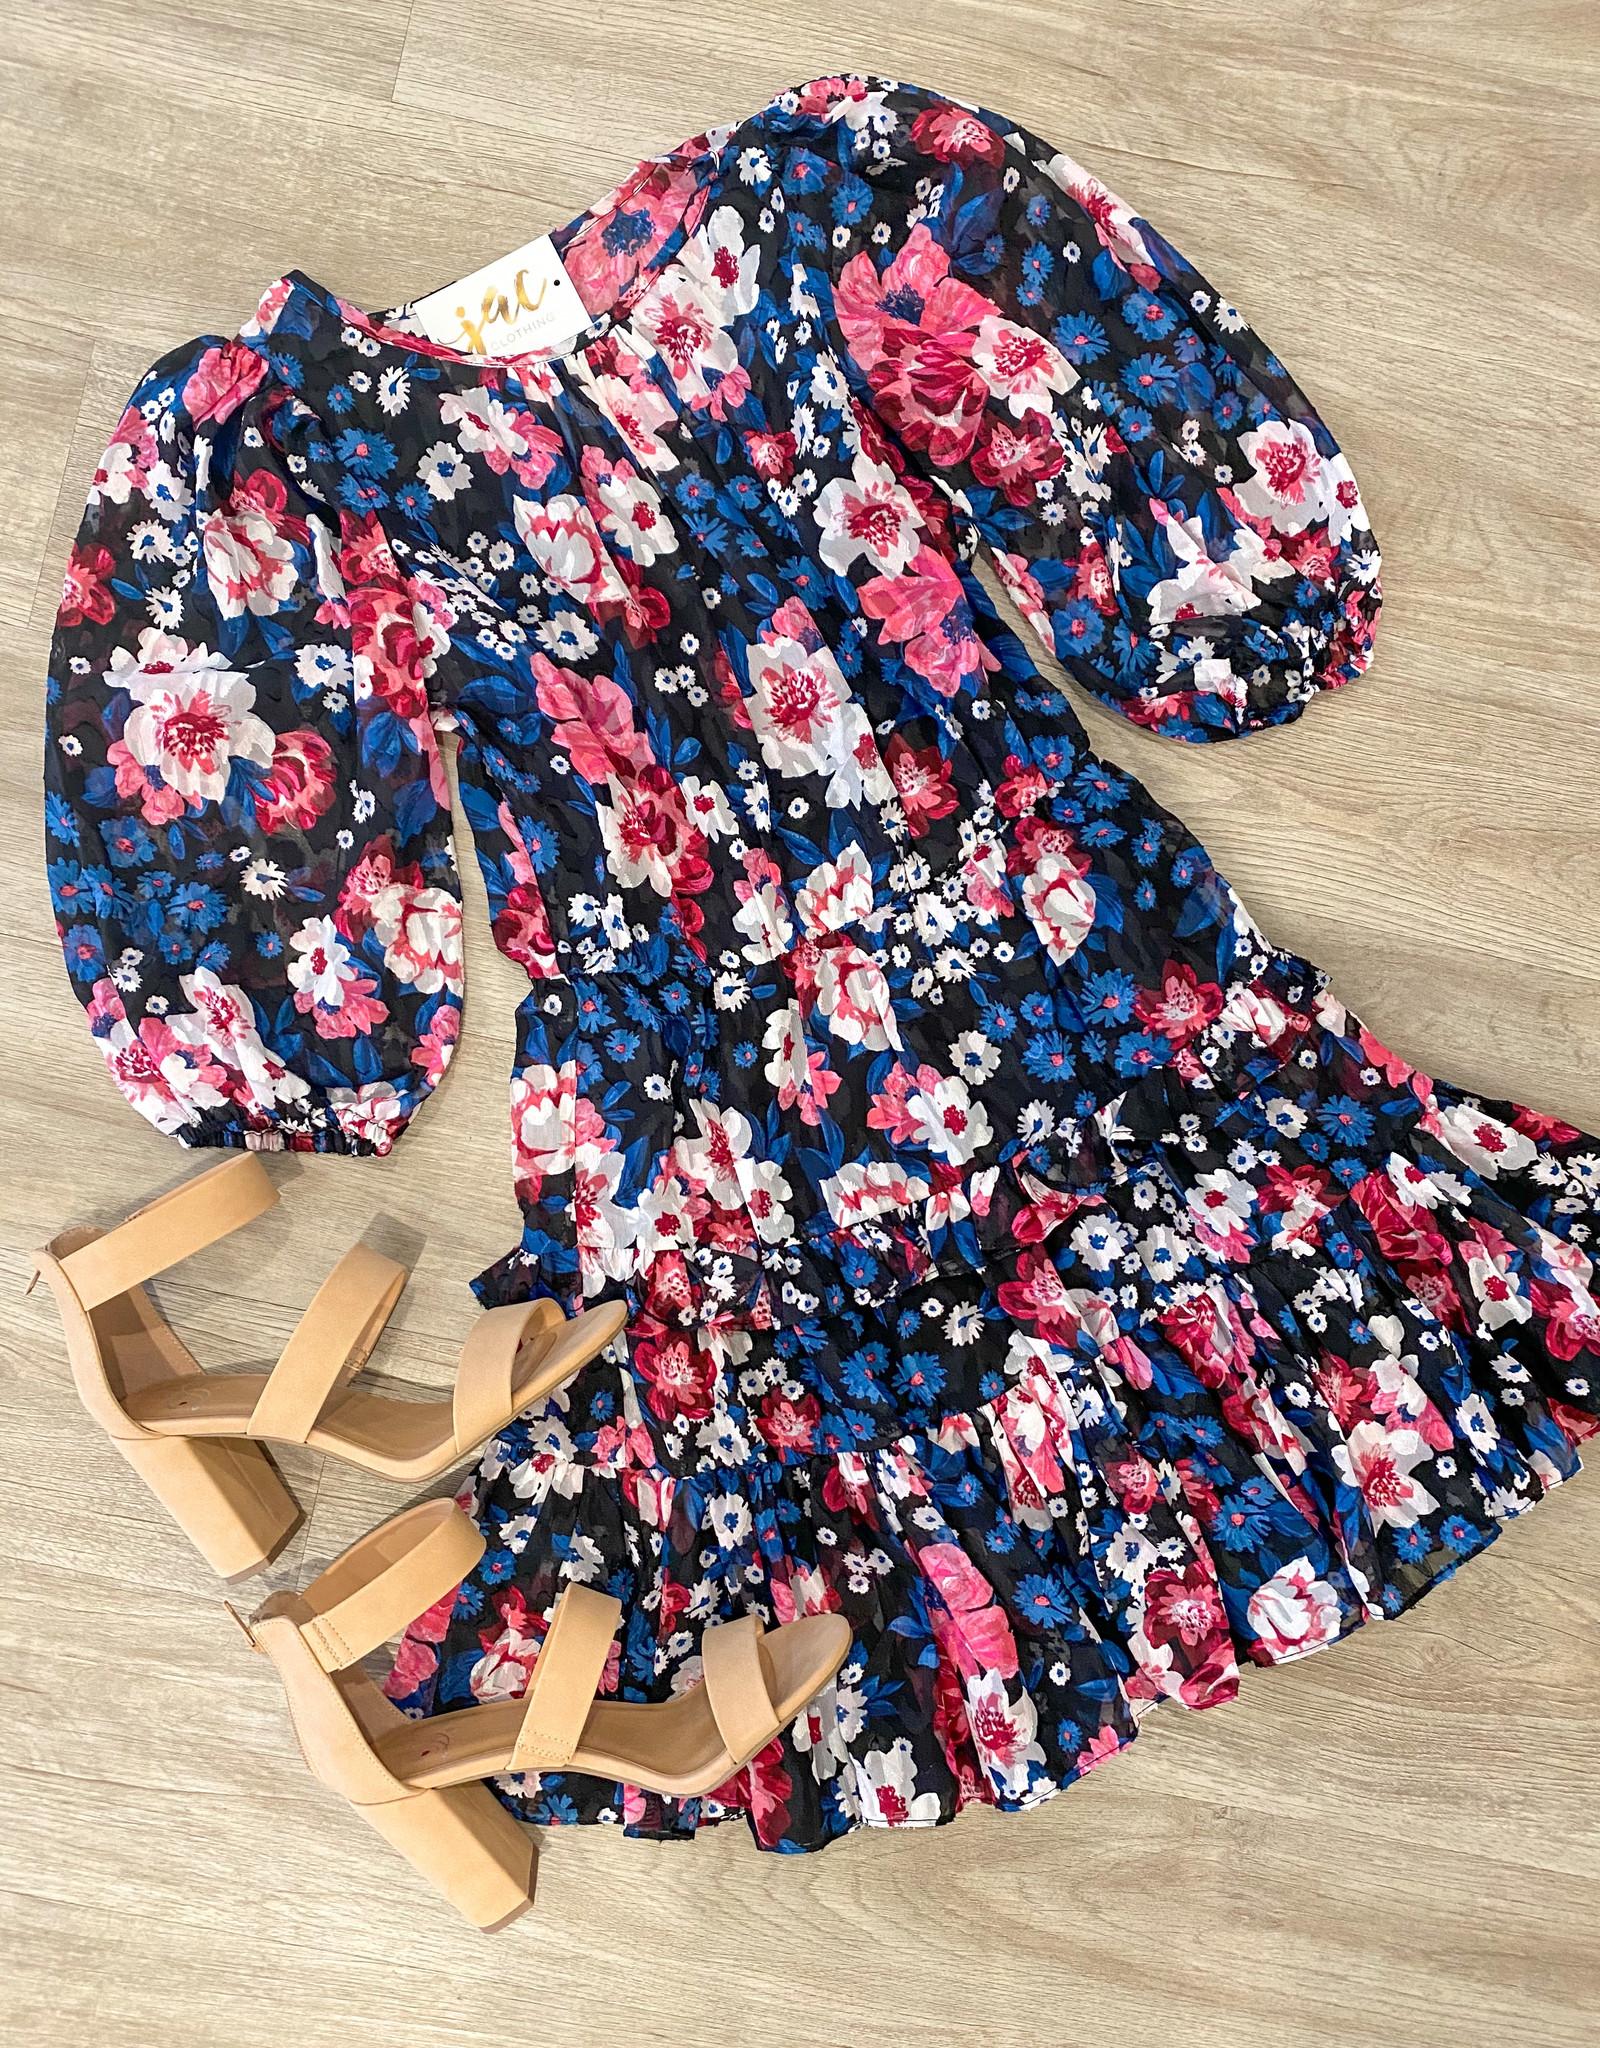 Wild Floral Ruffle Dress